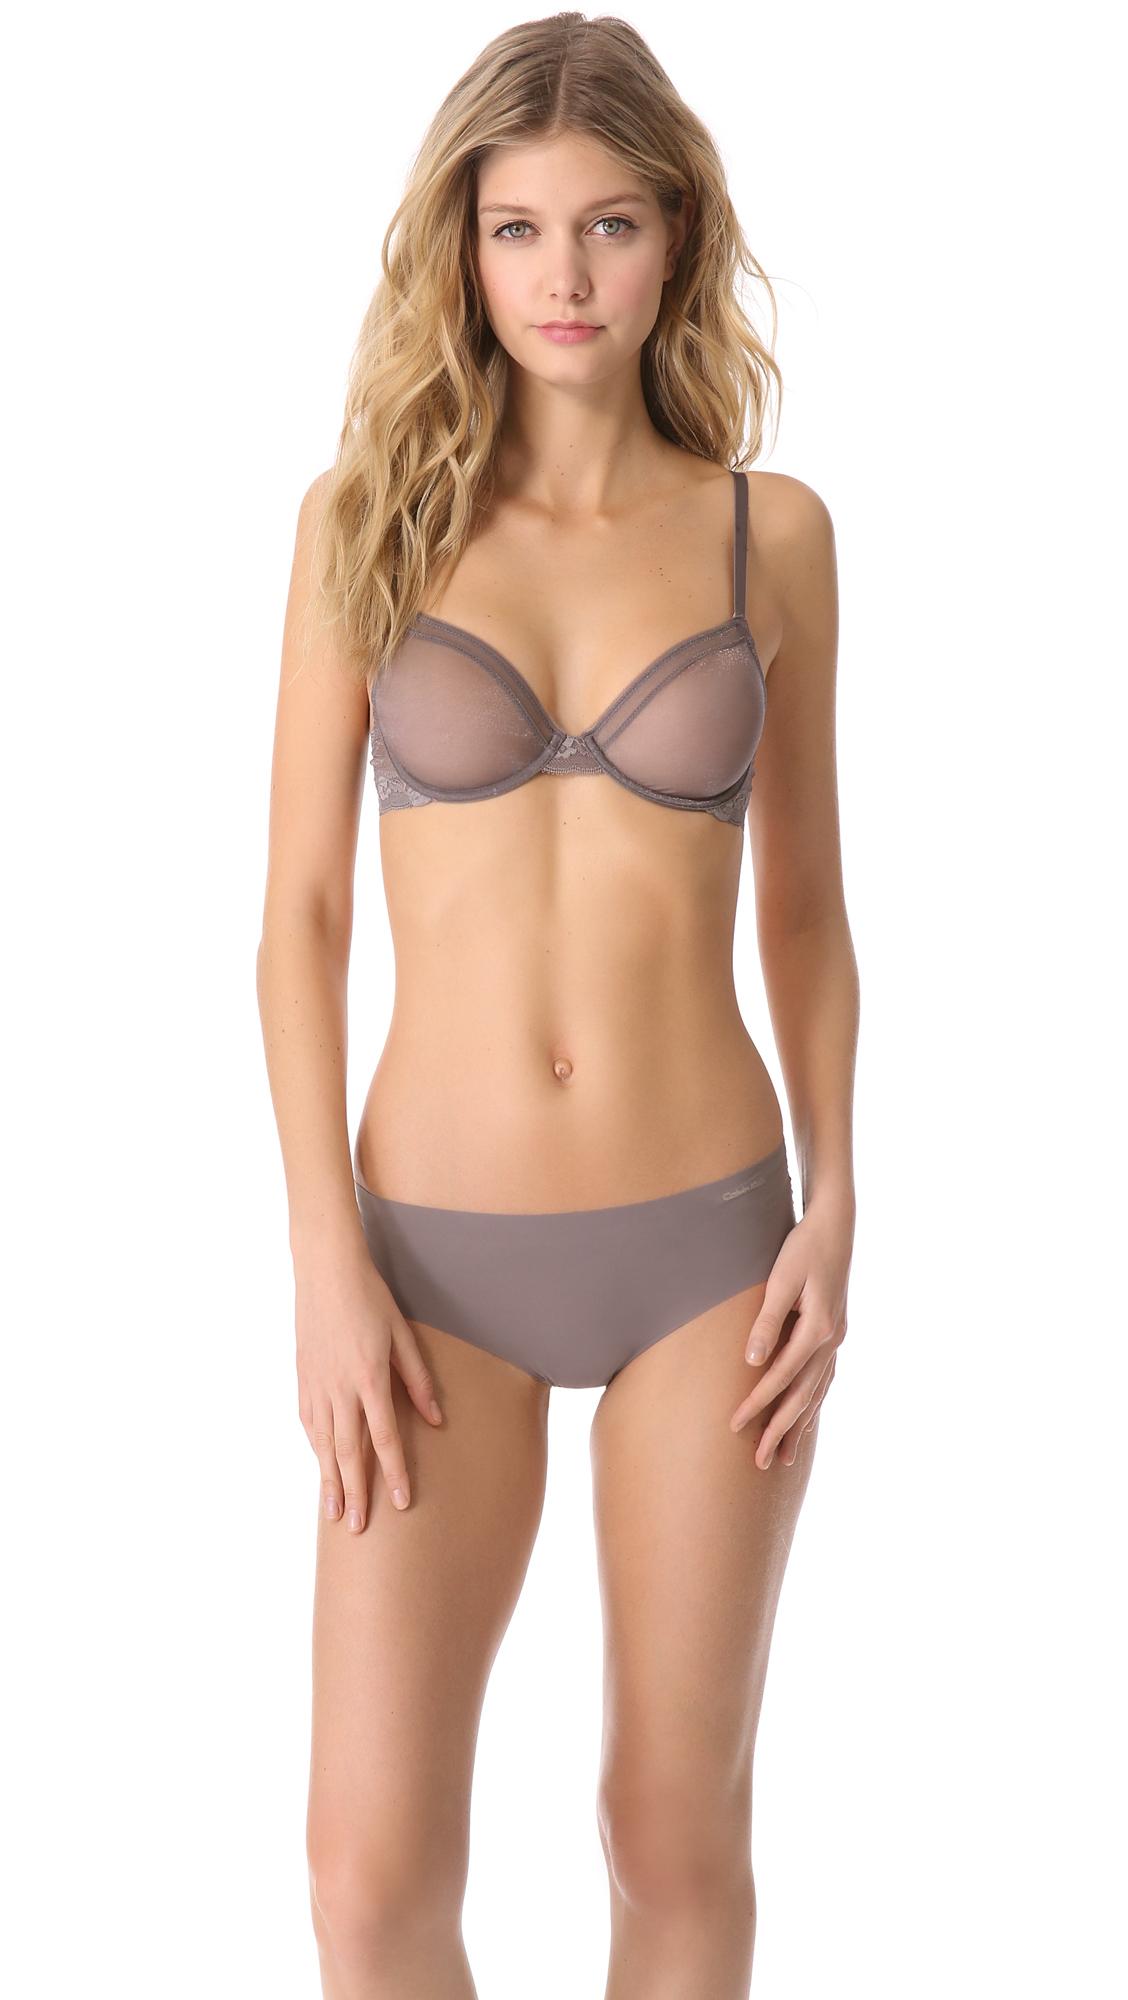 72f1ba0df4 Calvin Klein Underwear Luster Unlined Underwire Bra on PopScreen